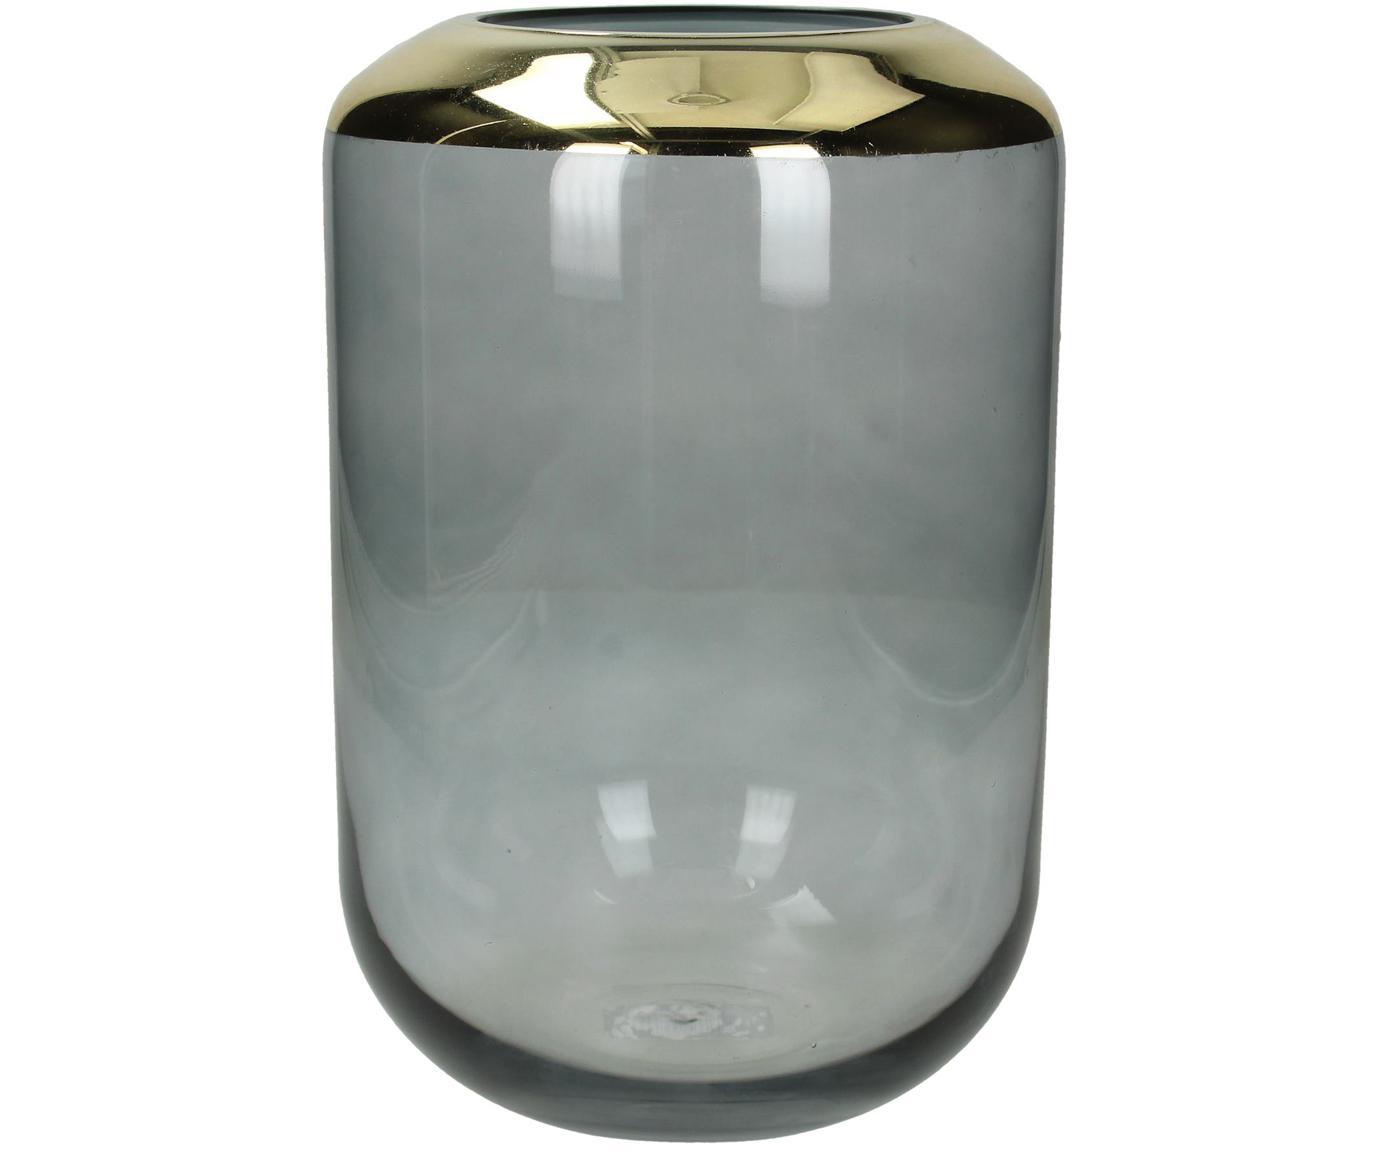 Vaso in vetro Janak, Vetro, Grigio, trasparente, dorato, Ø 16 x Alt. 25 cm